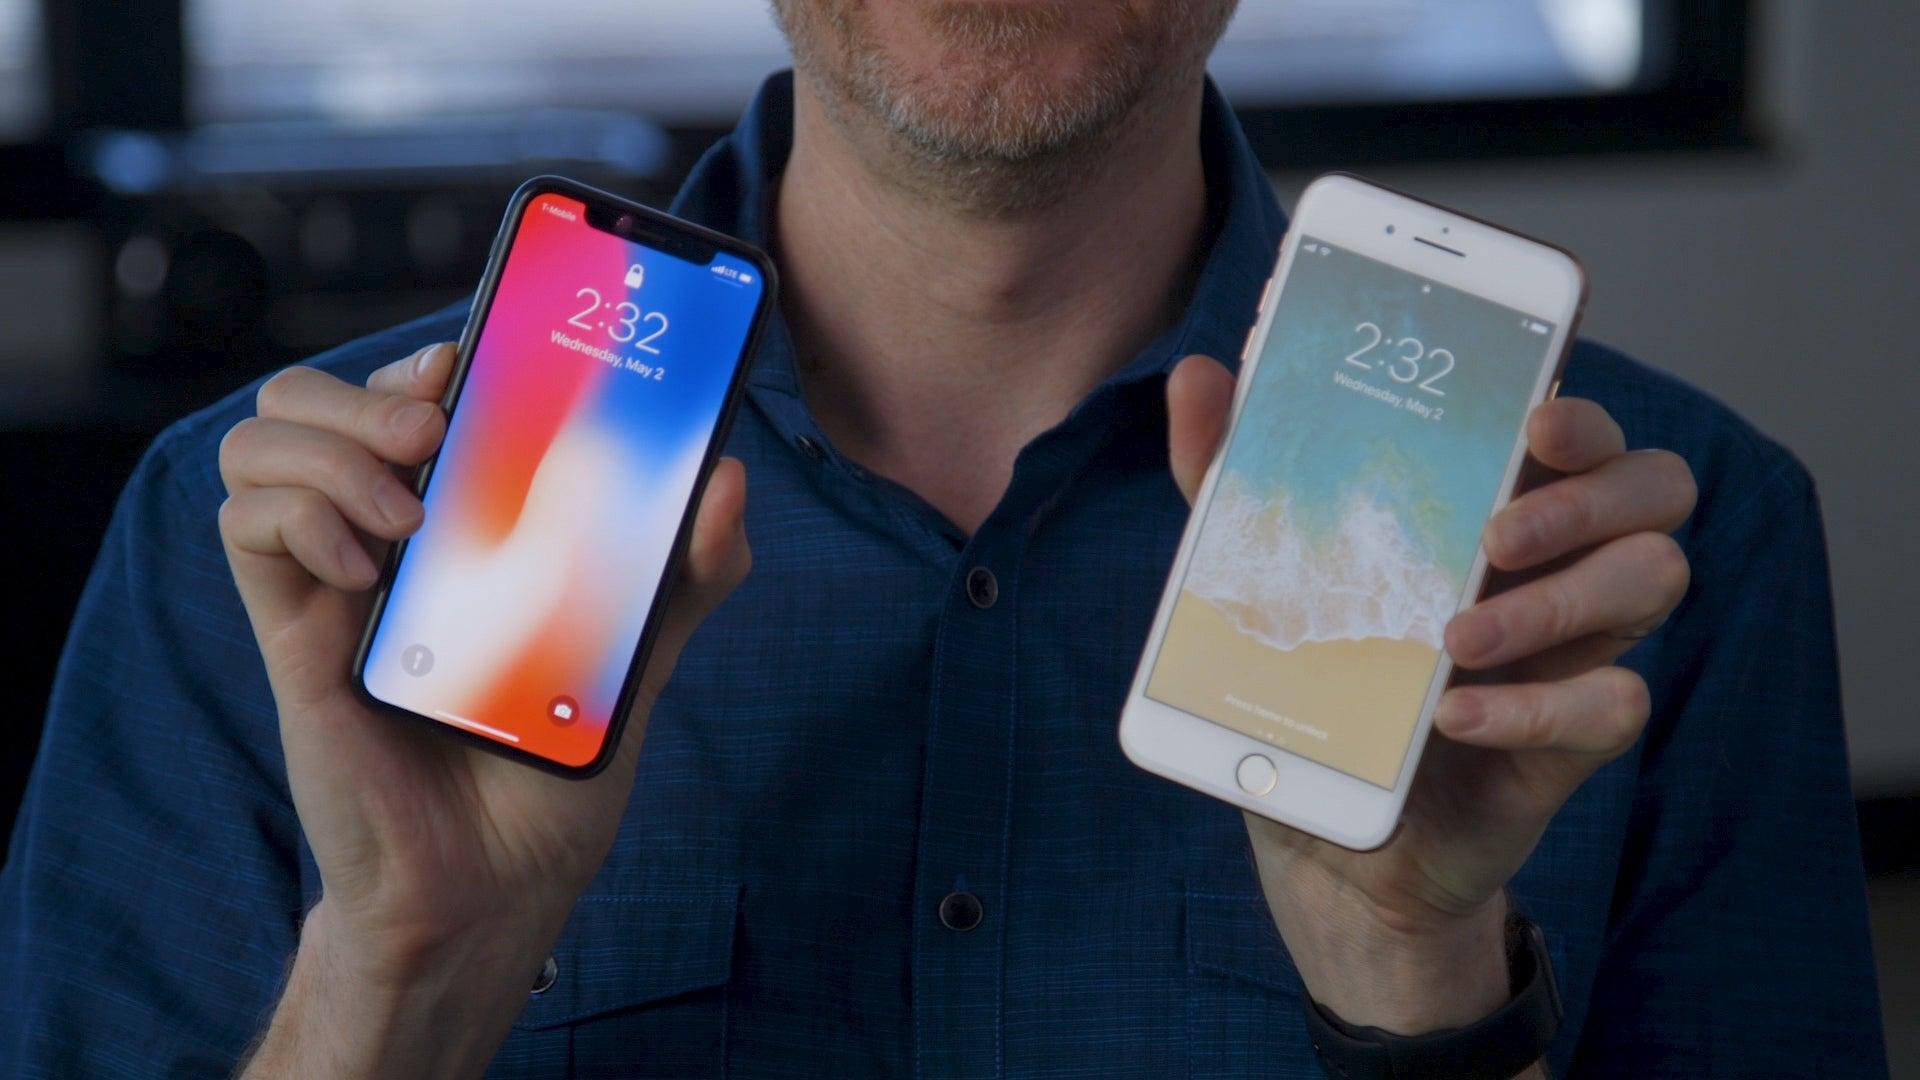 iPhone X or iPhone 8 Plus